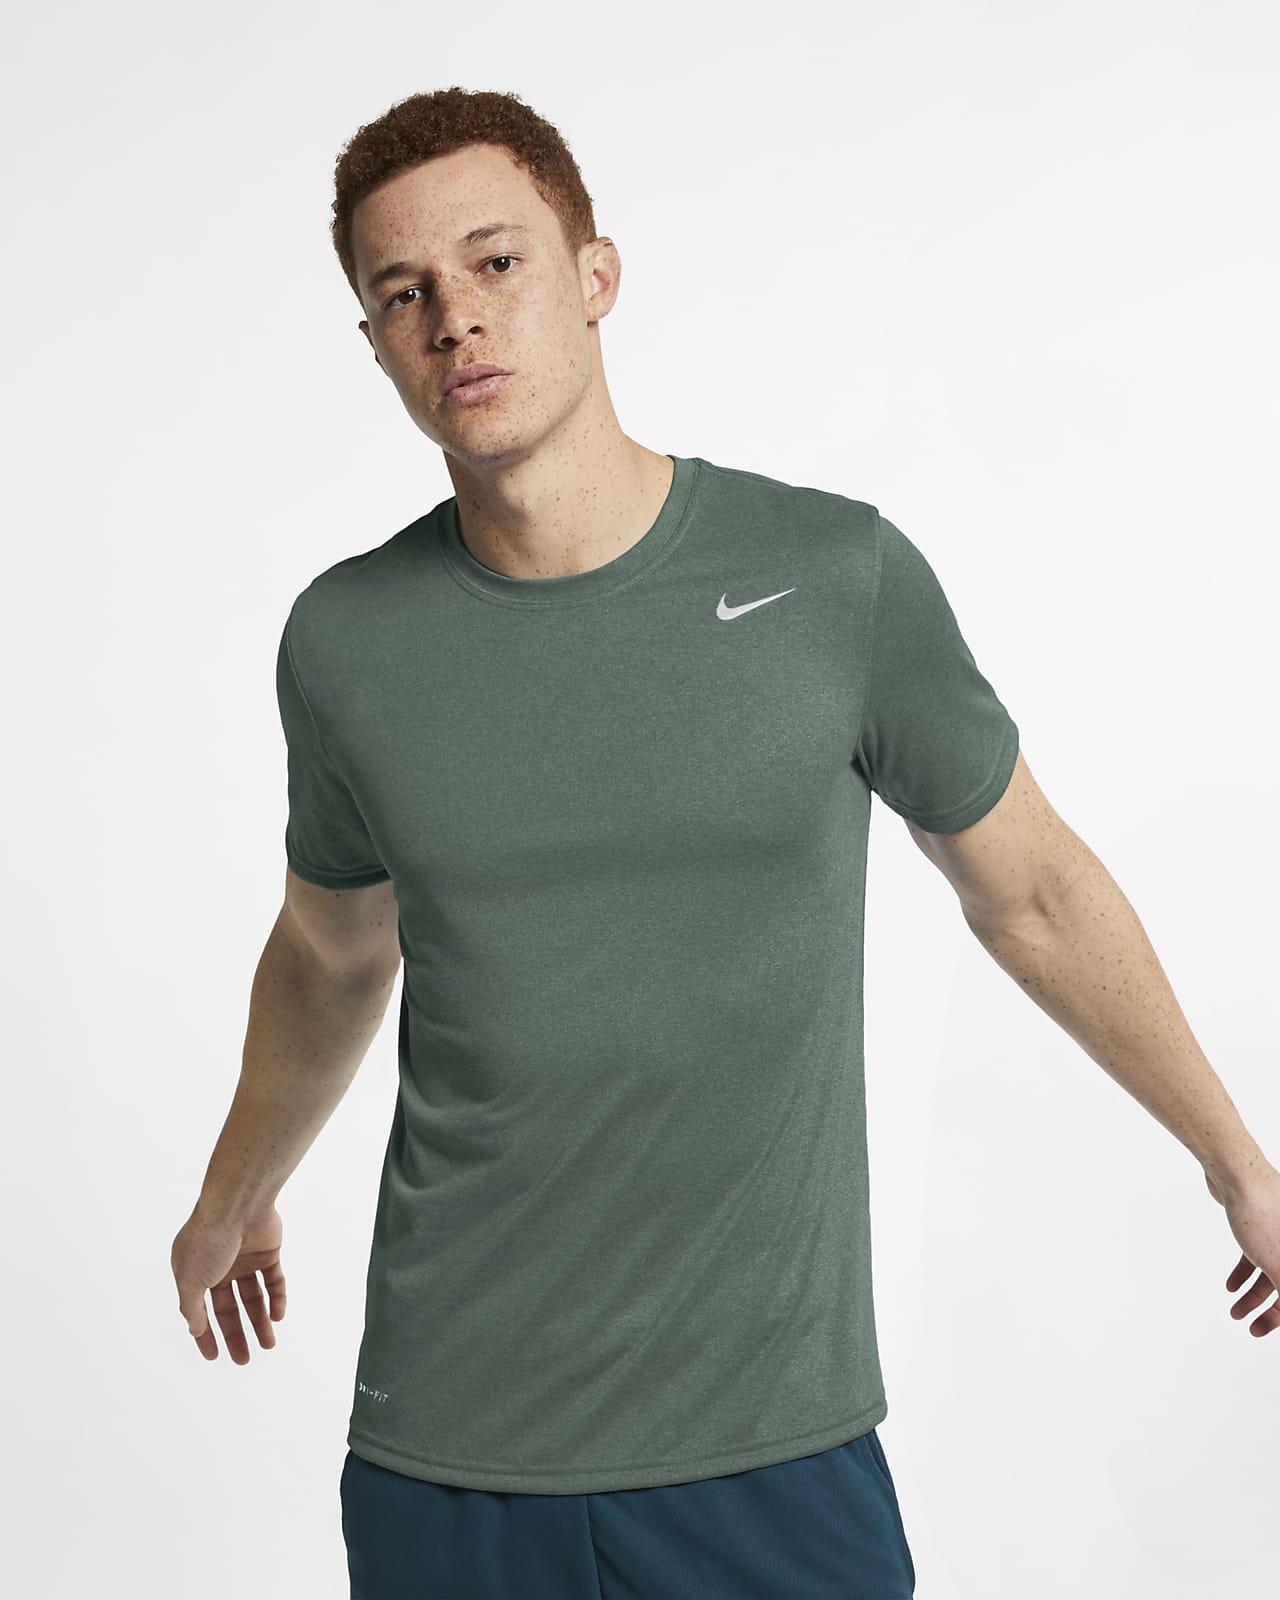 Nike Dri-FIT Legend Men's Training T-Shirt